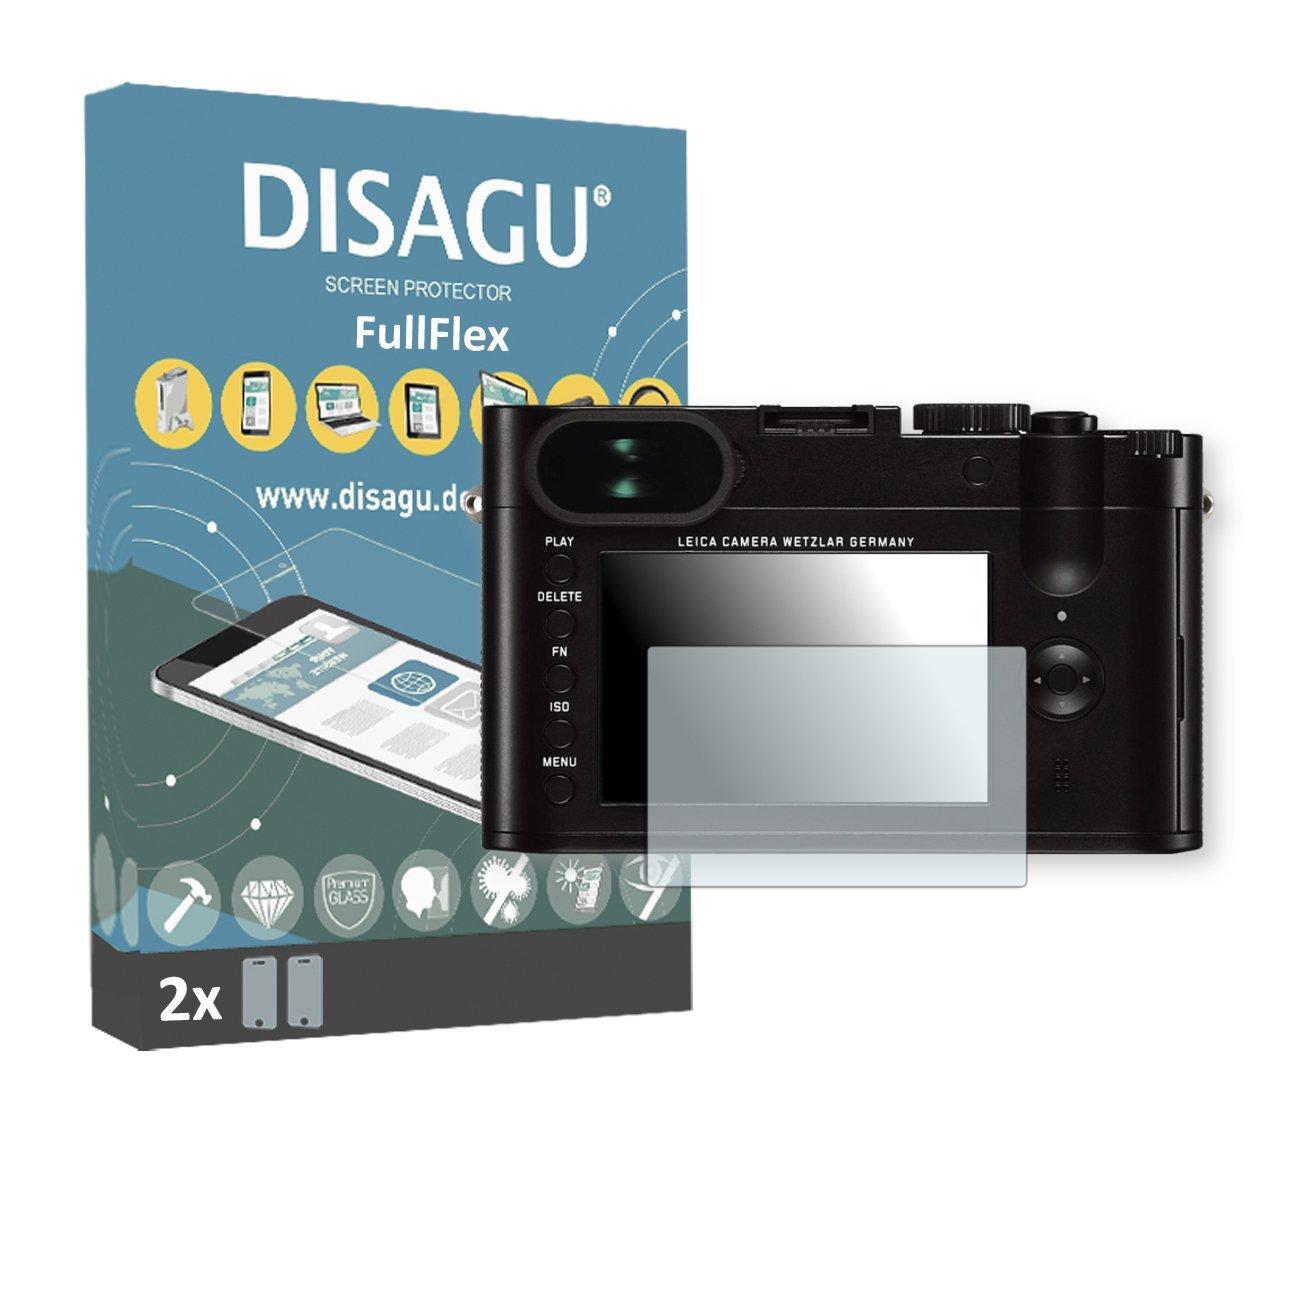 2 x Disagu FullFlex screen protector for Leica Q foil screen protector